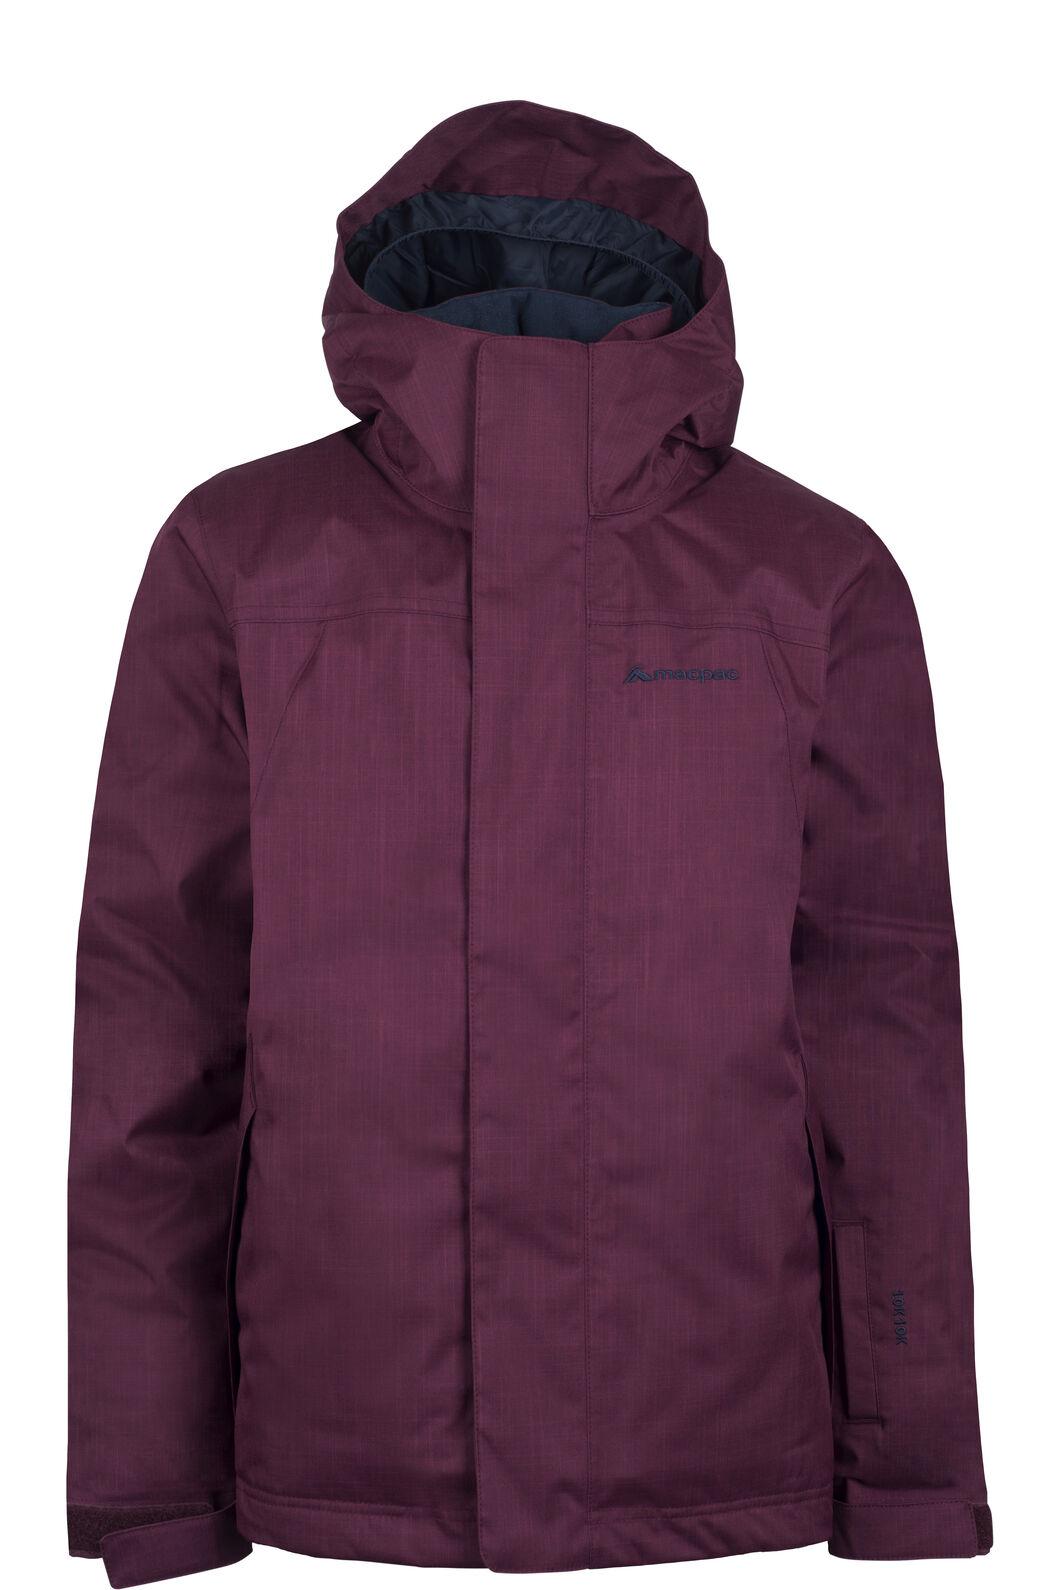 Macpac Spree Ski Jacket - Kids  9904e0e9c